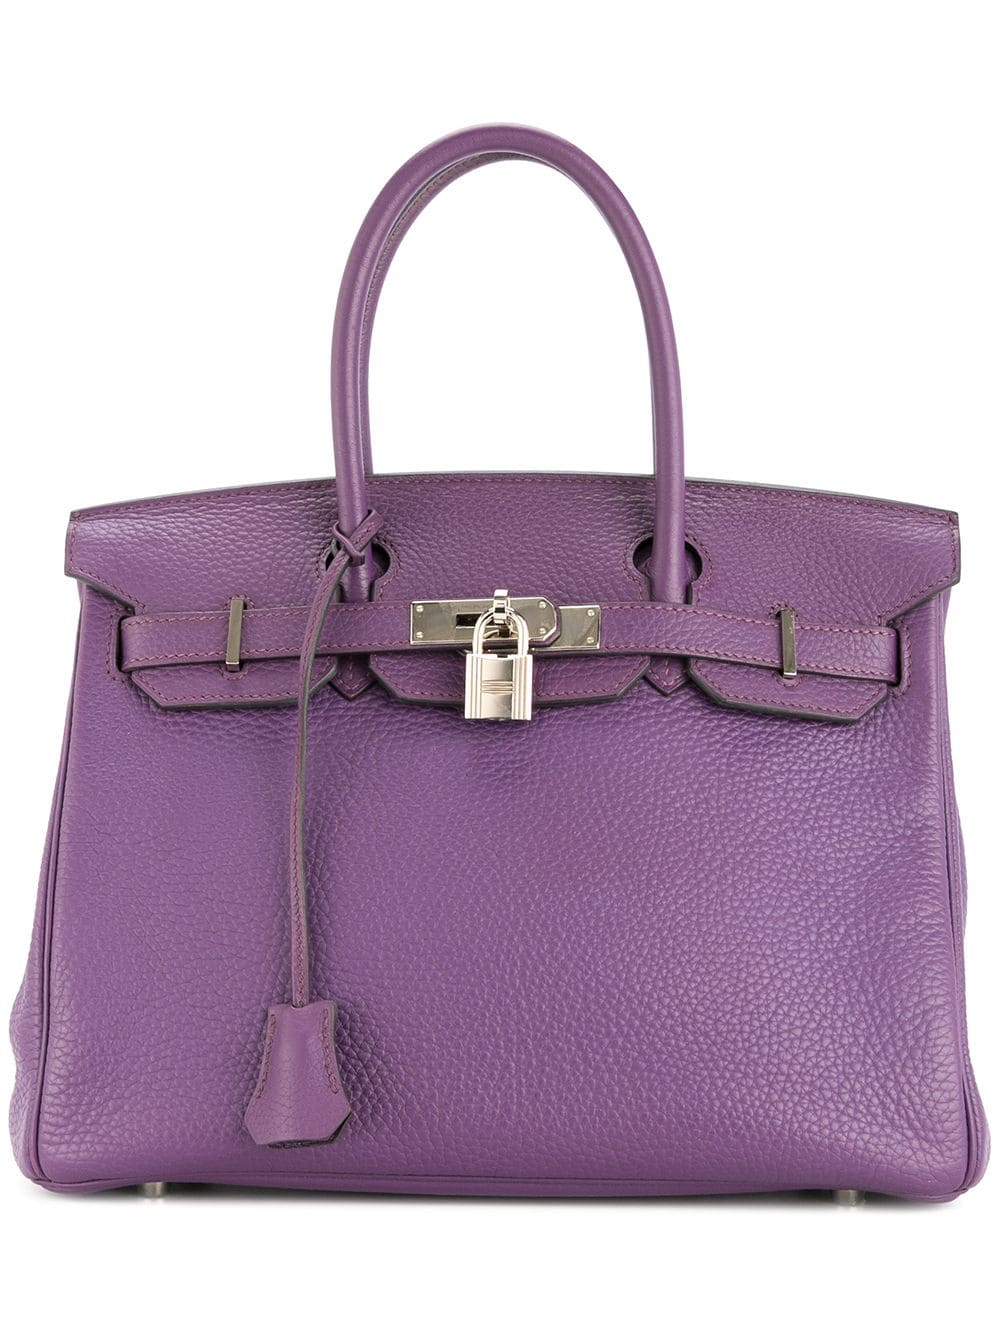 2012-Birkin-30-Handbag-Mosnar-Communications